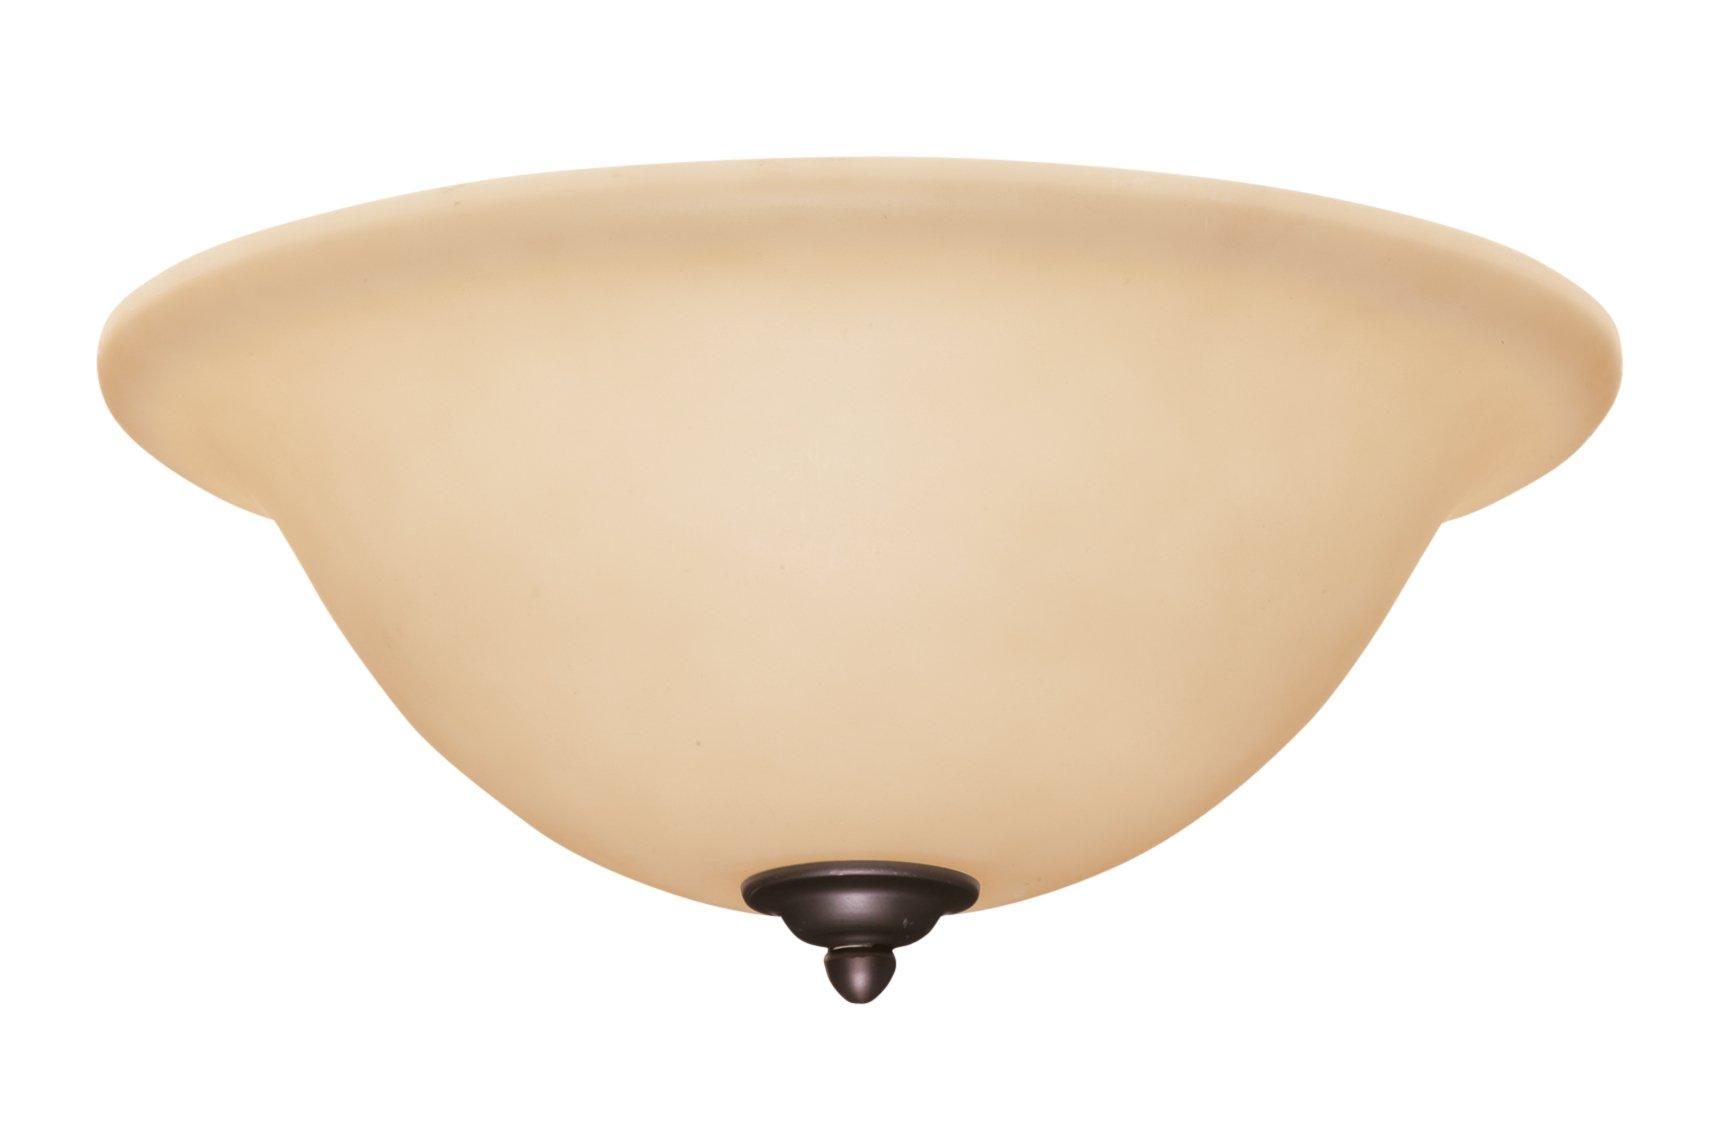 Emerson Ceiling Fans LK72ORB Amber Scavo Light Fixture for Ceiling Fans, Medium Base CFL